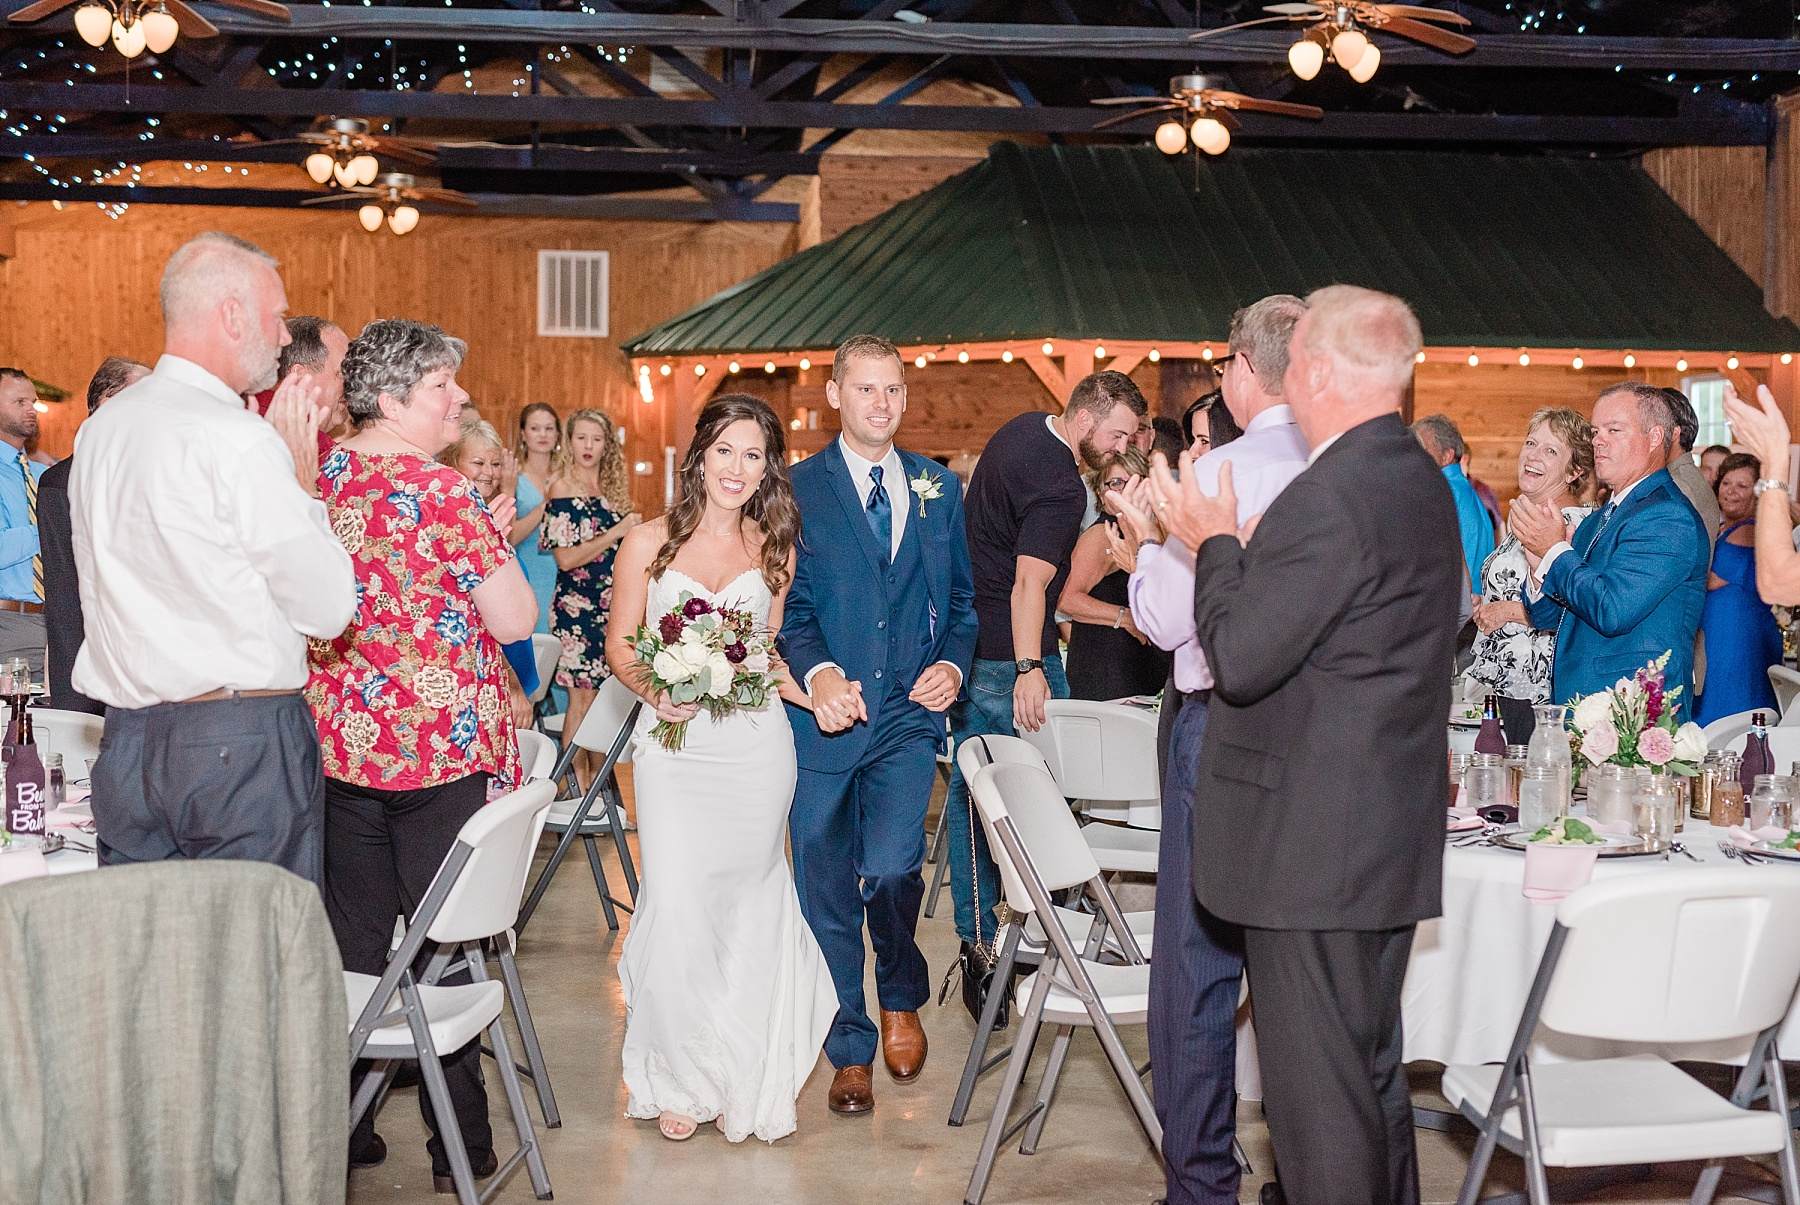 Romantic Summer Sunset Wedding Ceremony at Little Piney Lodge St. Louis Missouri by Kelsi Kliethermes Photography Fine Art Photographer_0015.jpg